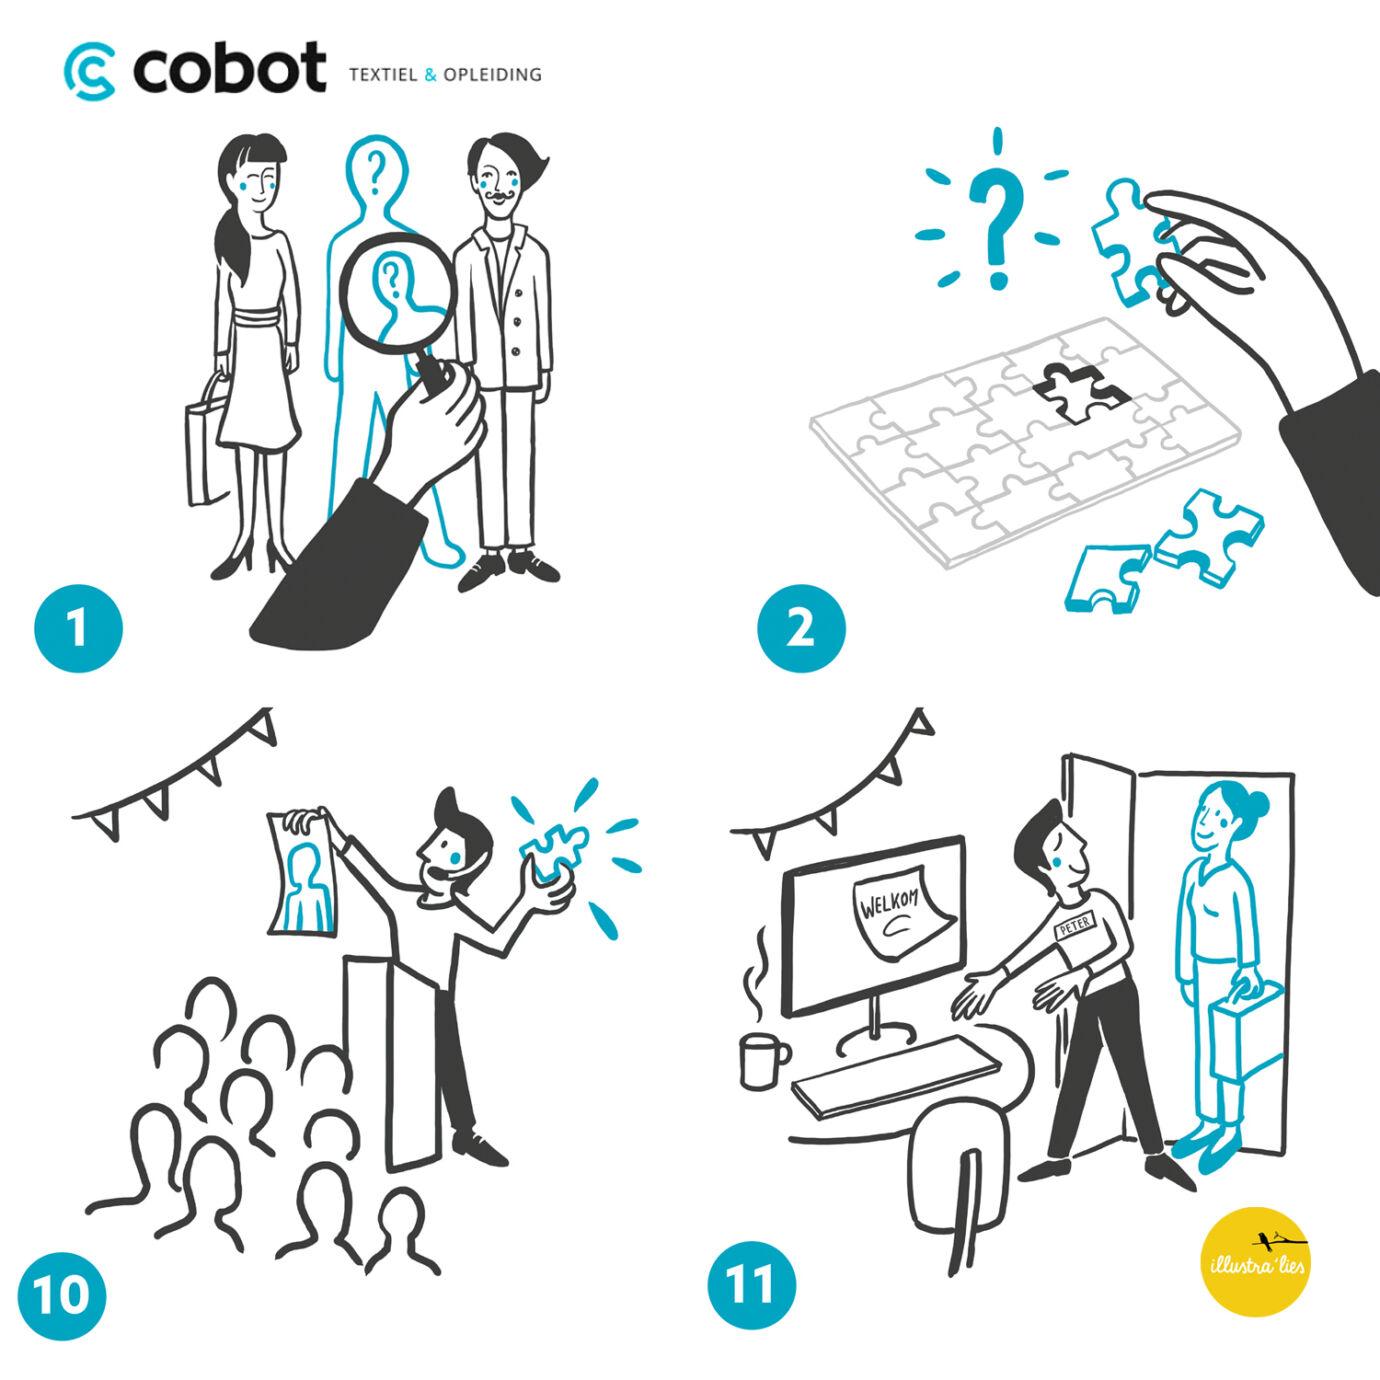 06 Cobot stappenplan overzichtje